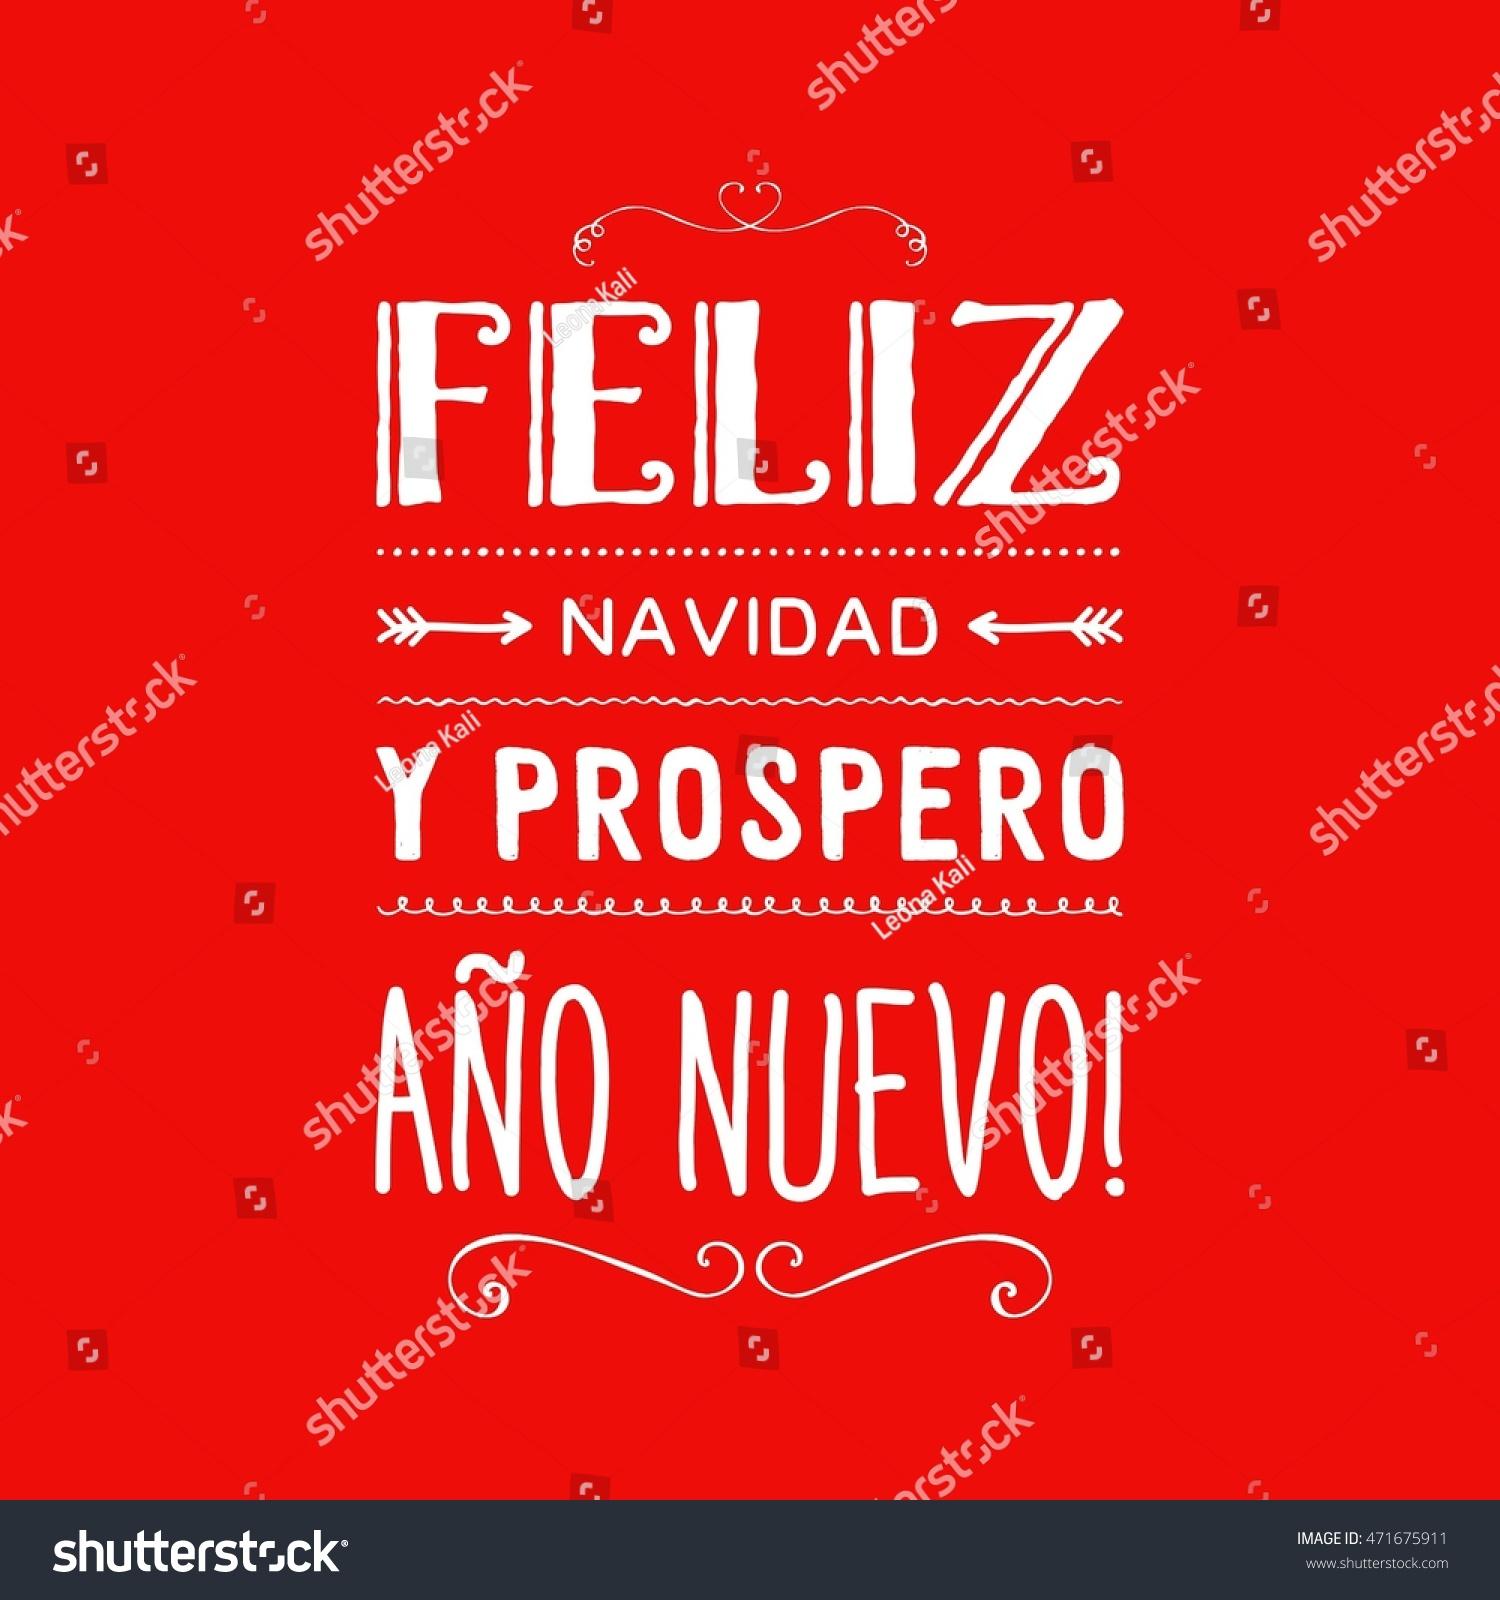 Merry christmas card template greetings spanish stock illustration merry christmas card template with greetings in spanish language feliz navidad y prospero ano nuevo kristyandbryce Images